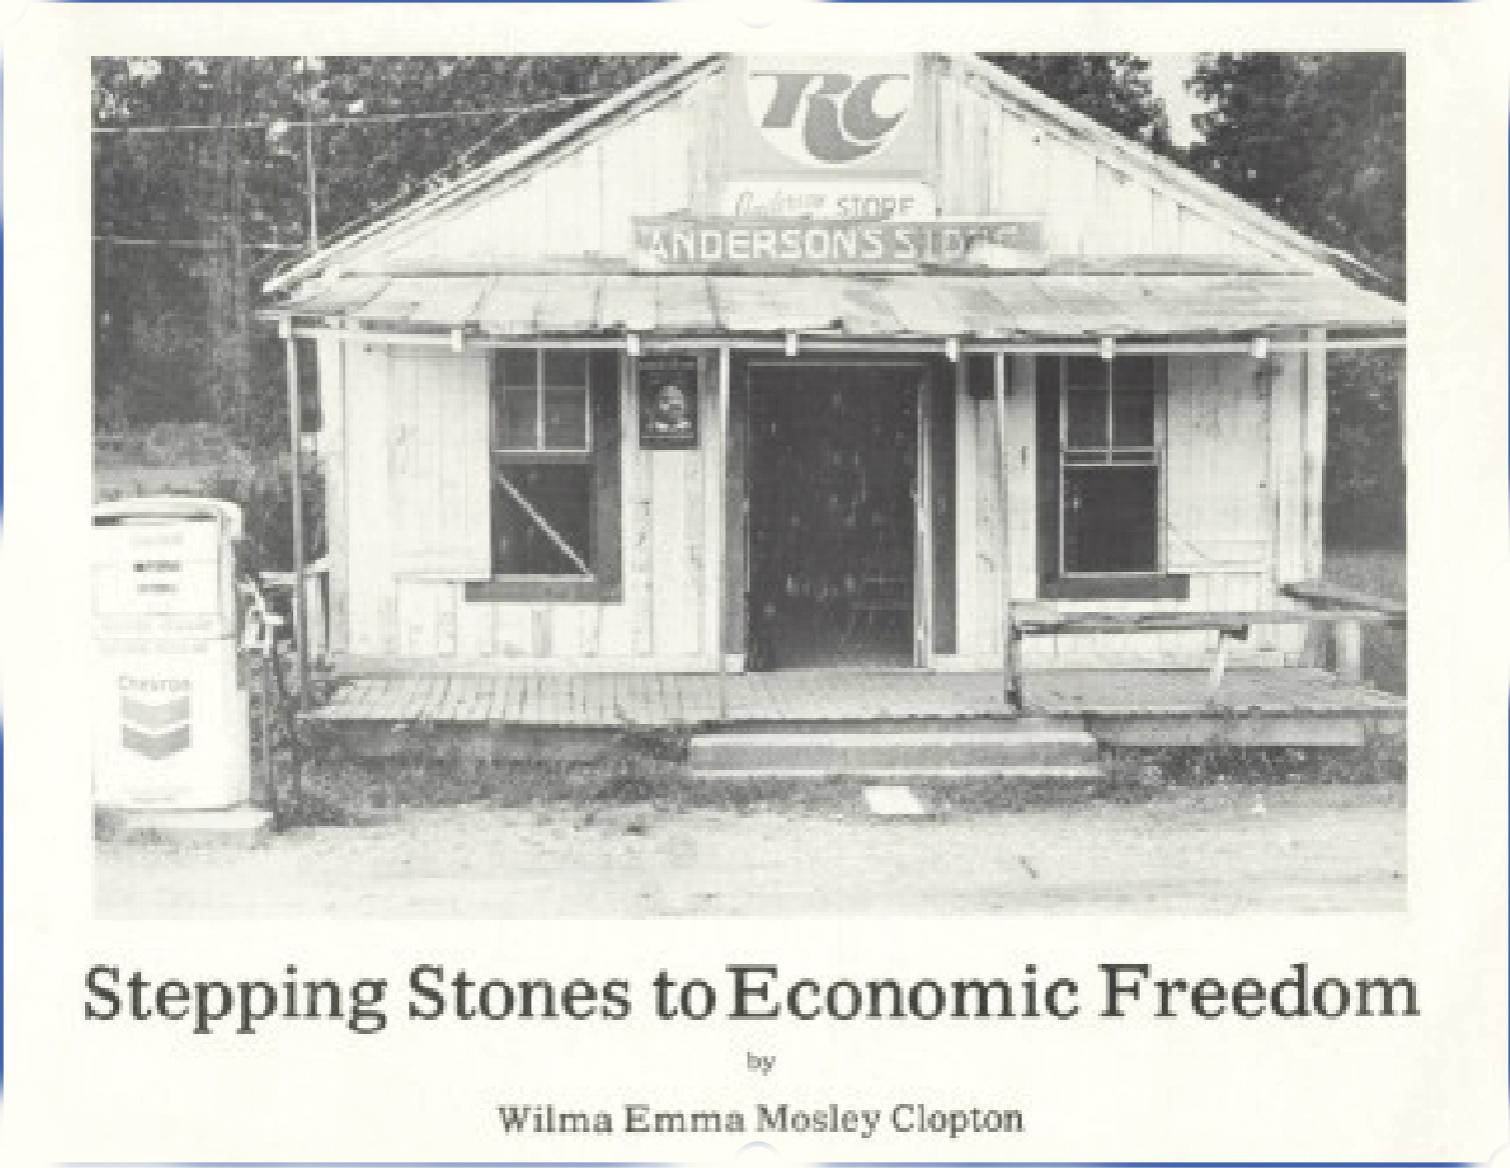 steppingstonesbook